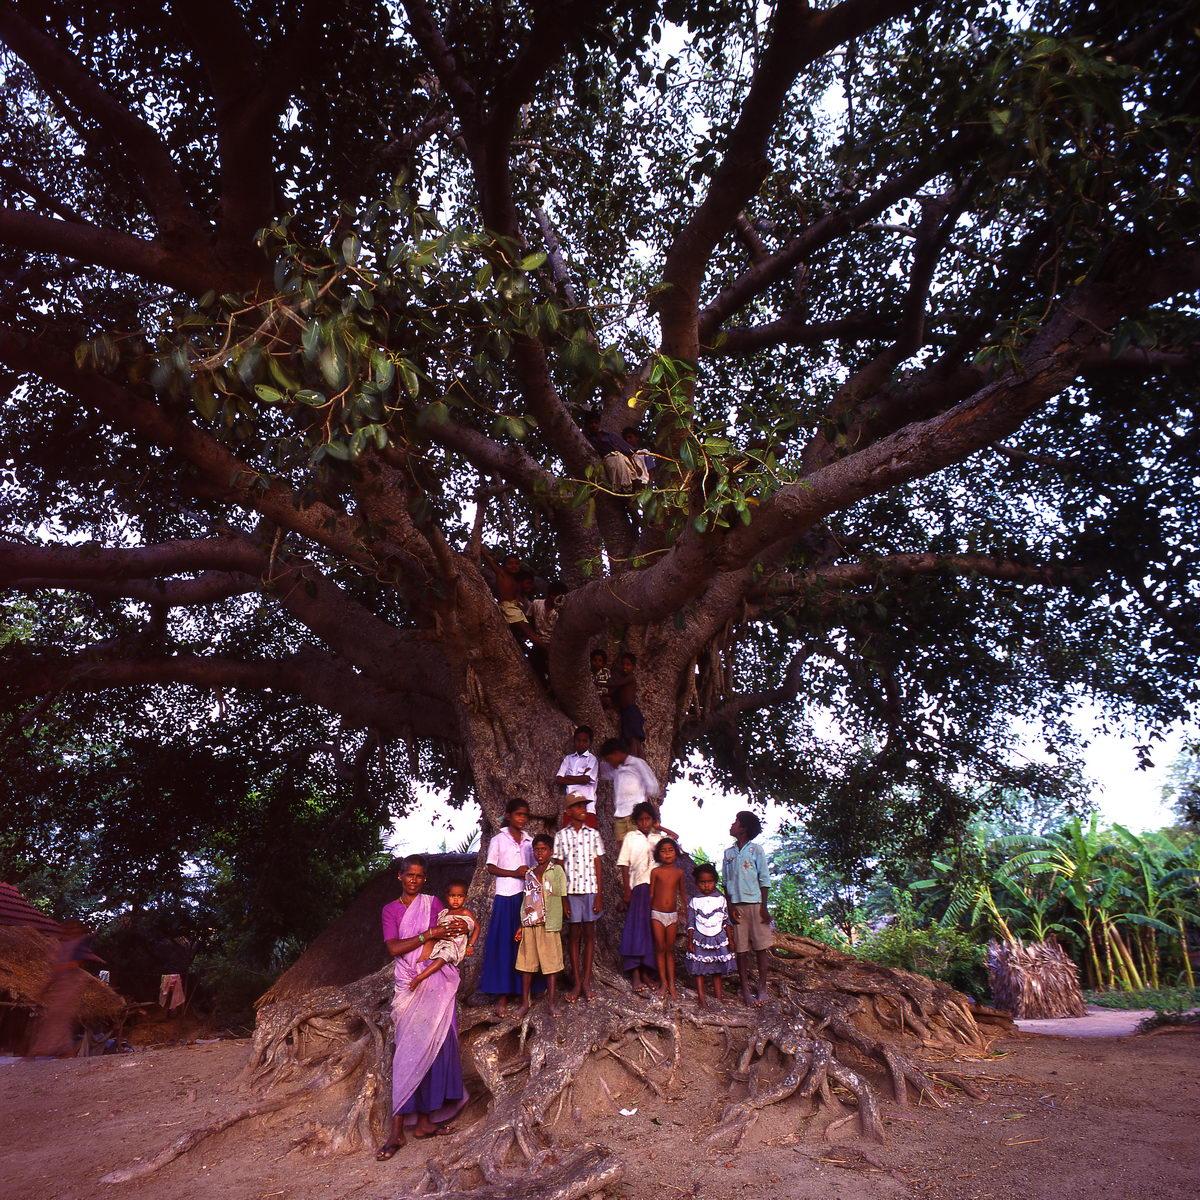 ficus_enfants_weelajabad_tamil_nadu_inde_002